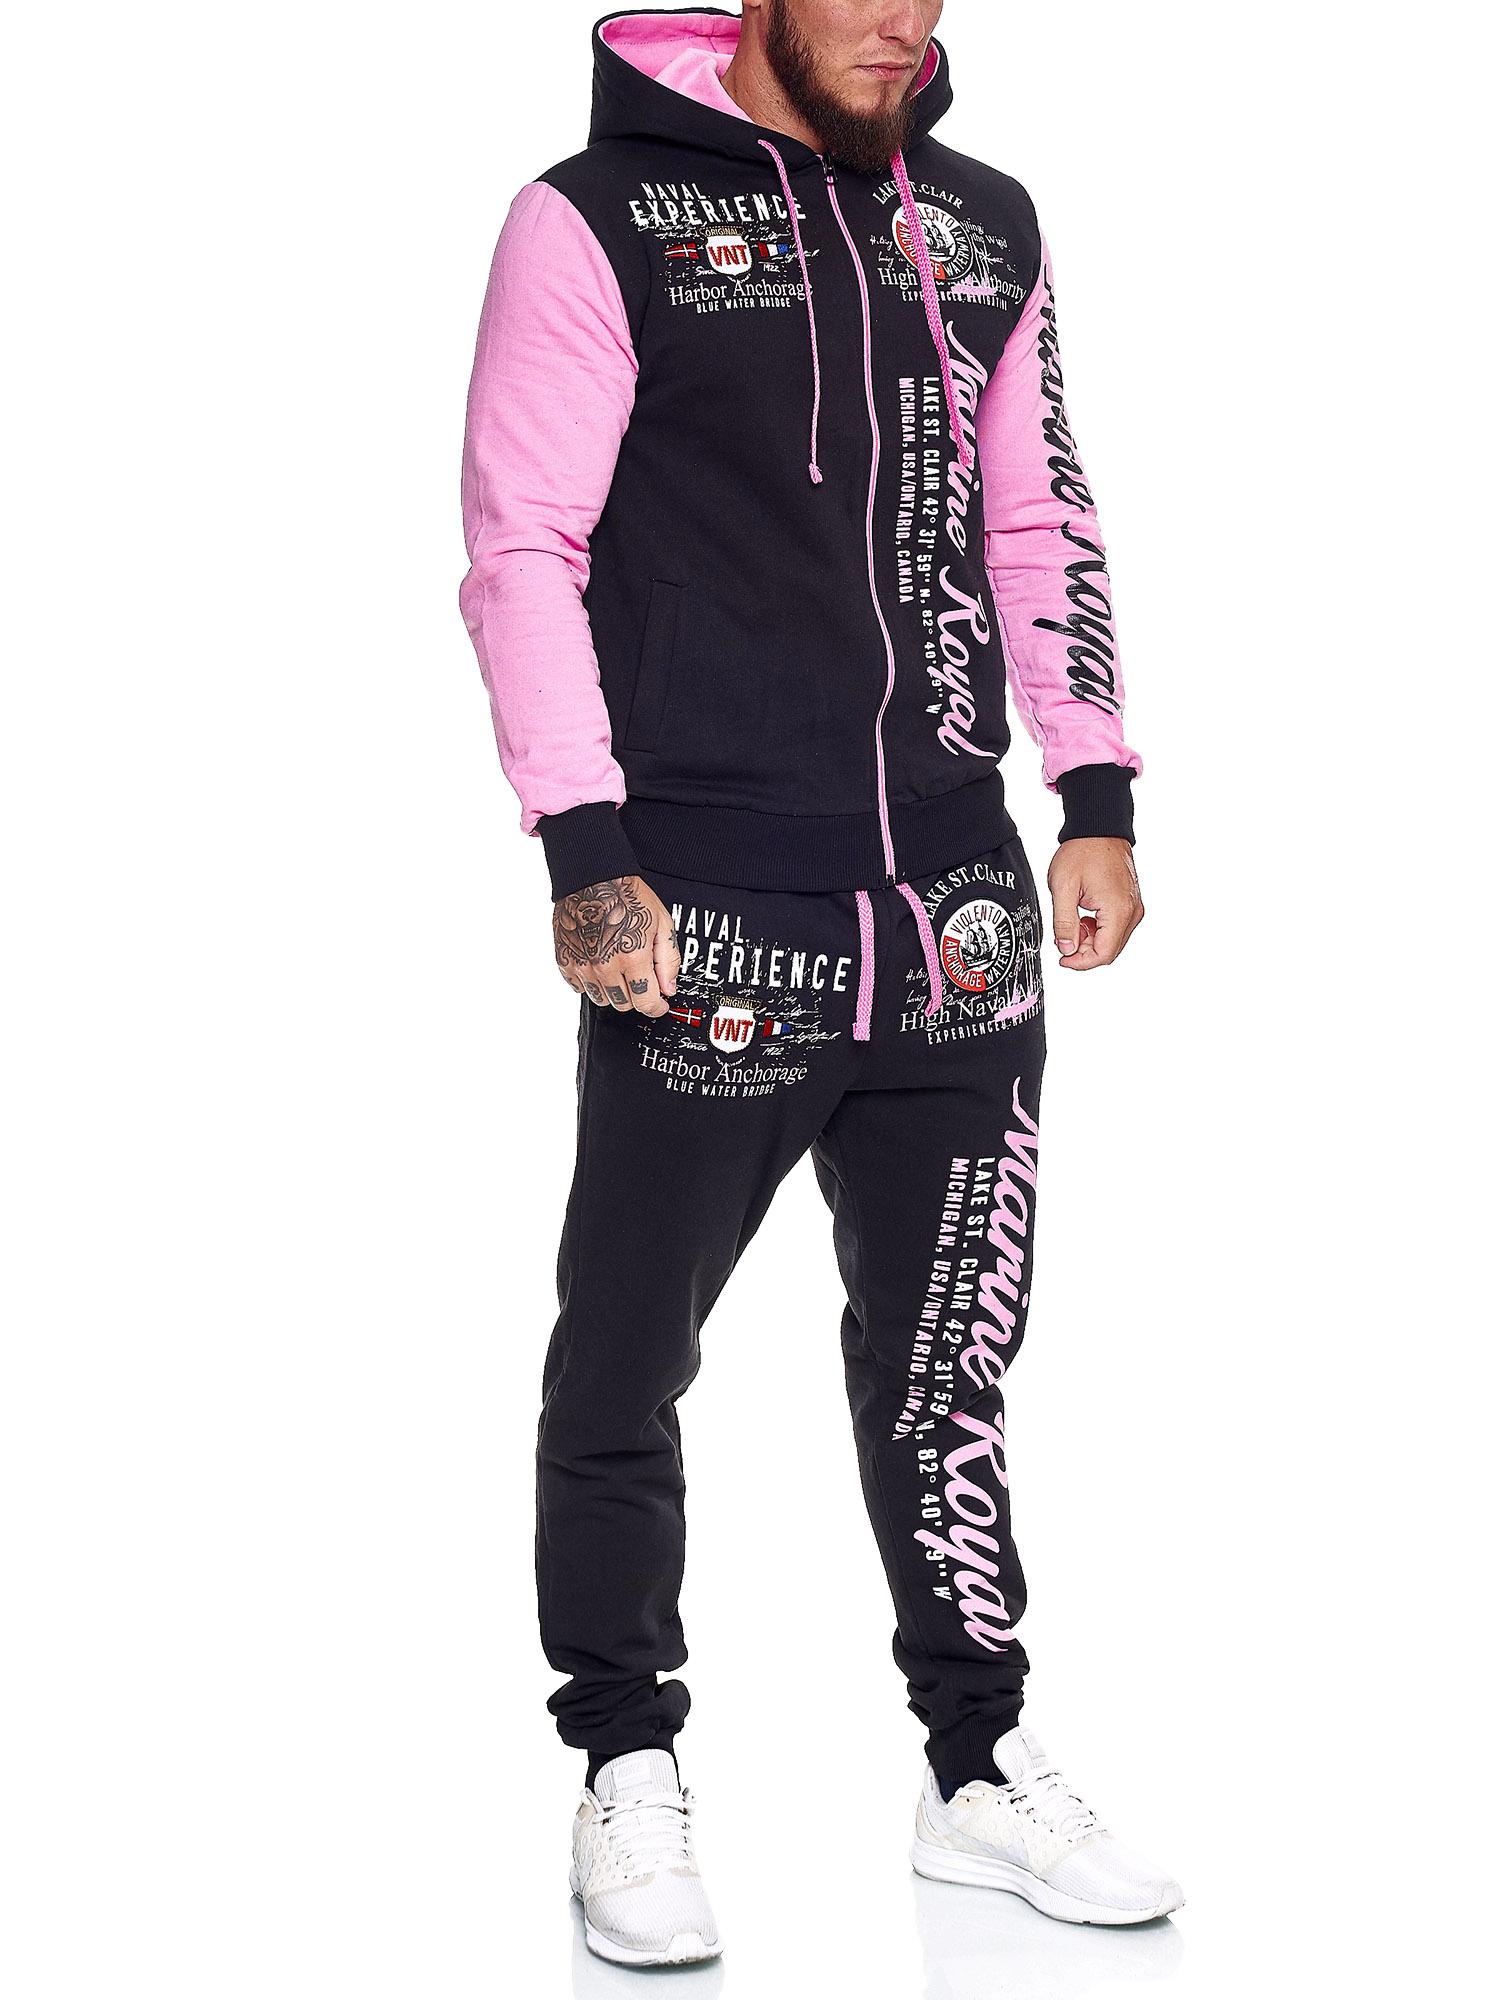 Damen-Jogginganzug-Frauen-Trainingsanzug-Sportanzug-Streetwear-JG-512-John-Kayna Indexbild 37